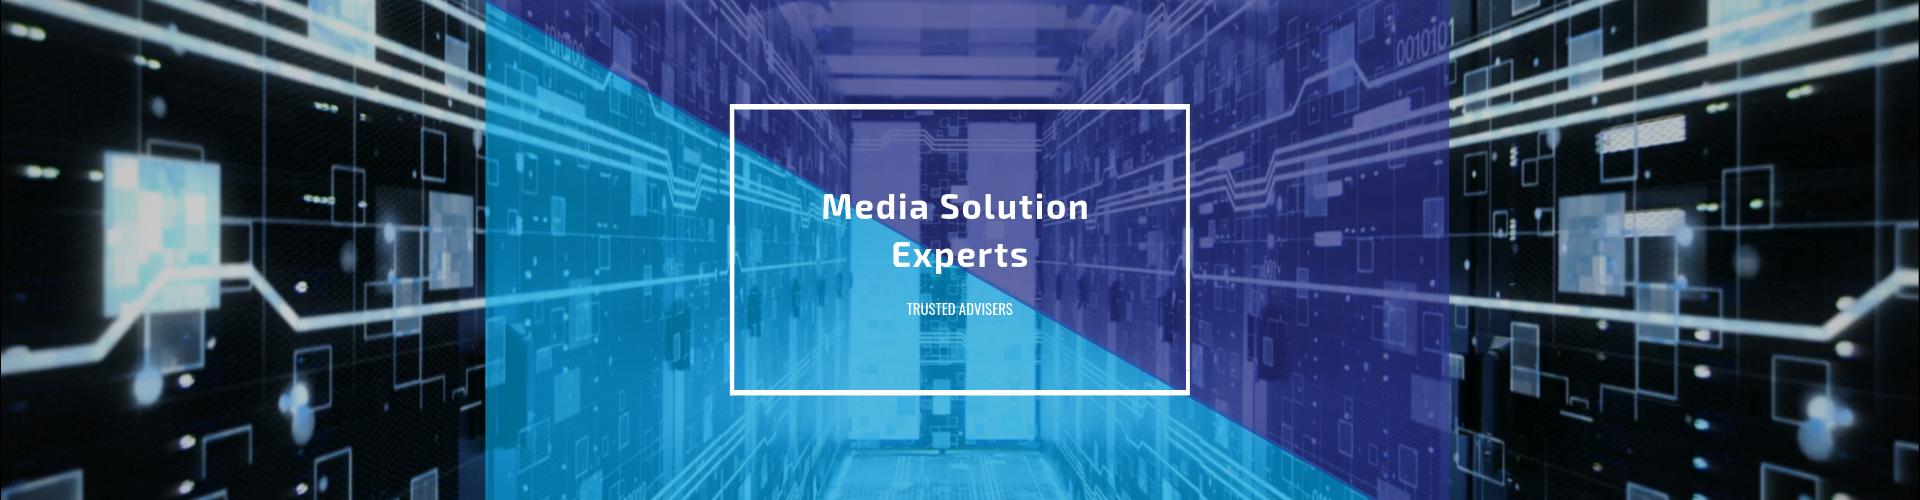 Digital Media Solution Experts